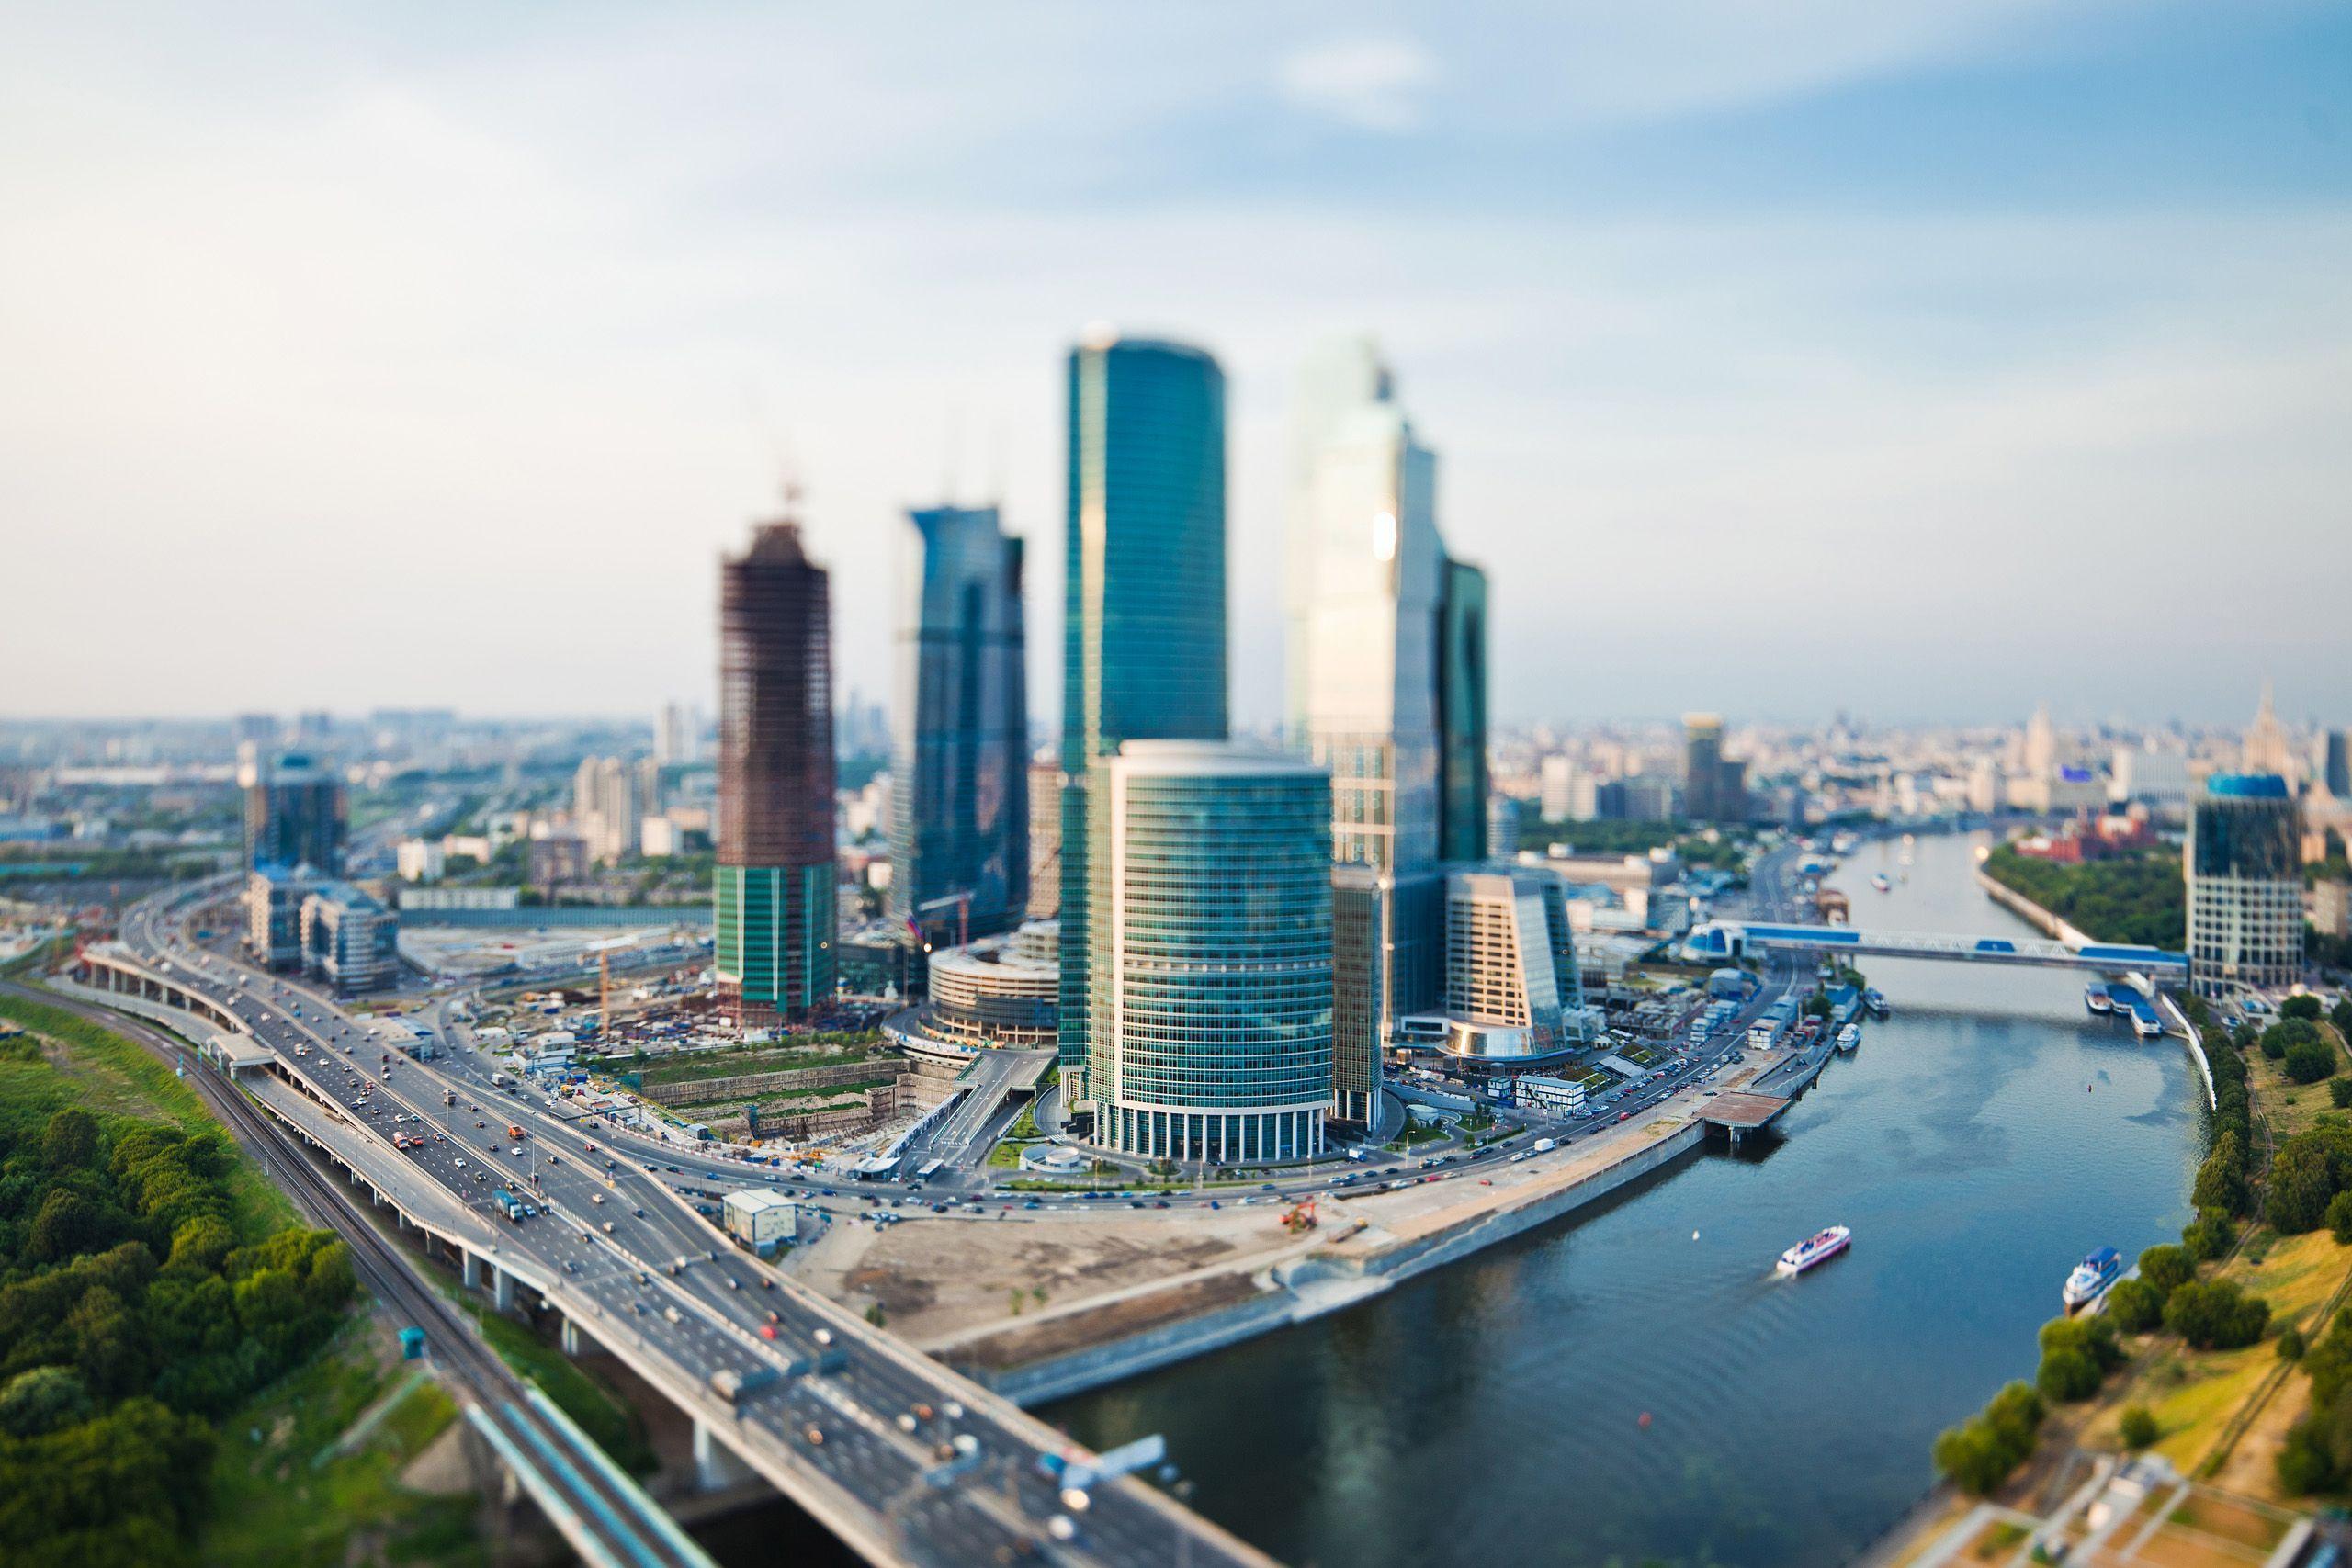 russia international business - HD1920×1280